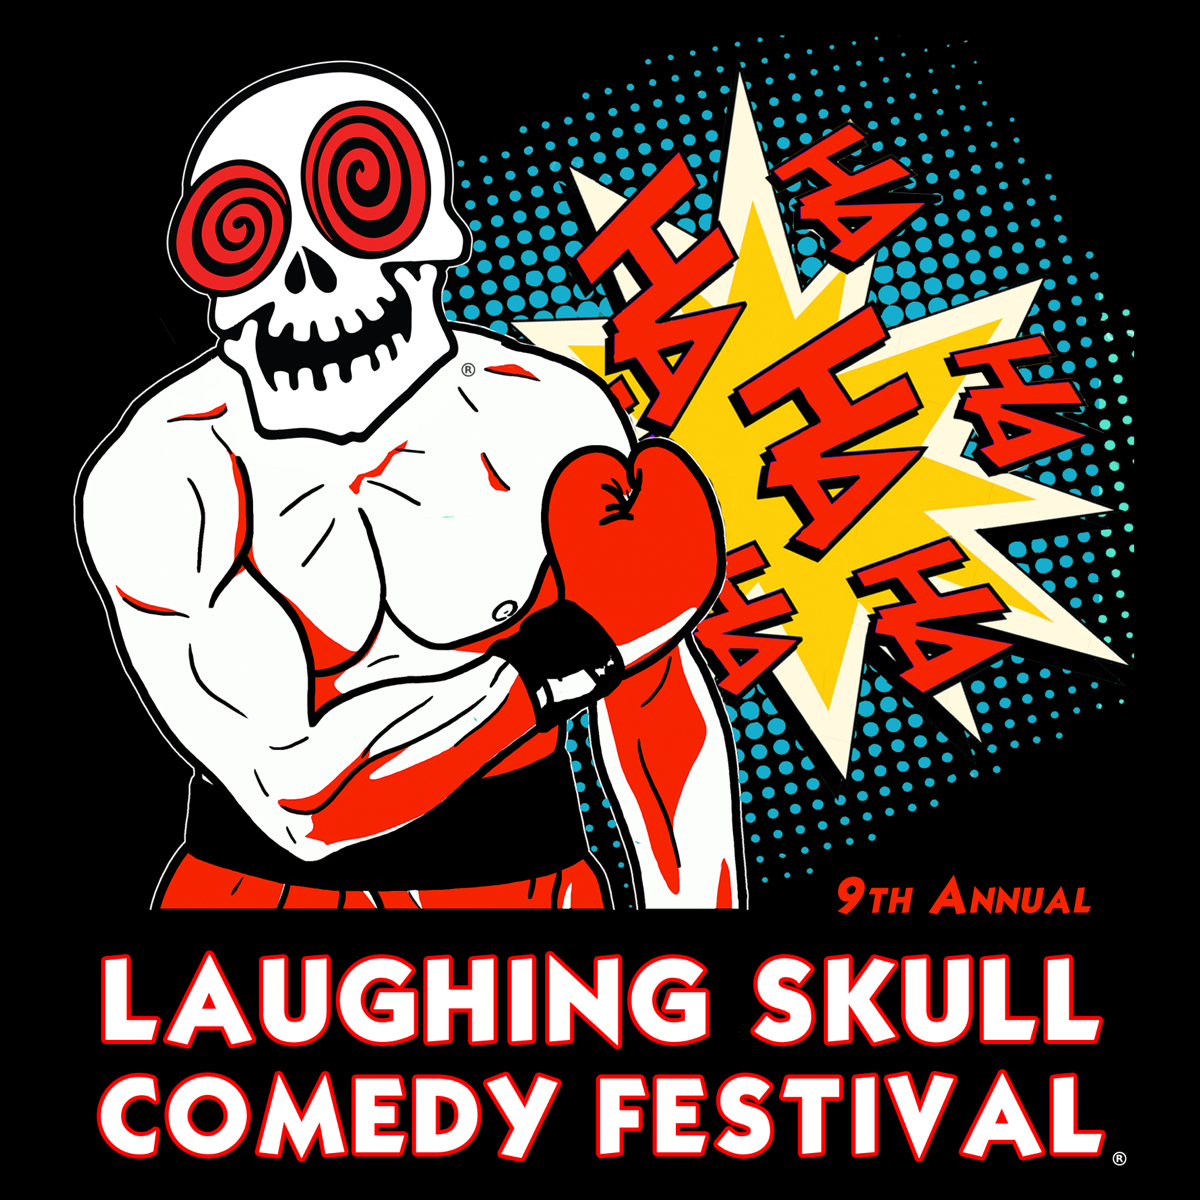 The 9th Annual Laughing Skull Comedy Festival — Thursday Show at Red Light Café — April 26, 2018 — Red Light Café, Atlanta, GA